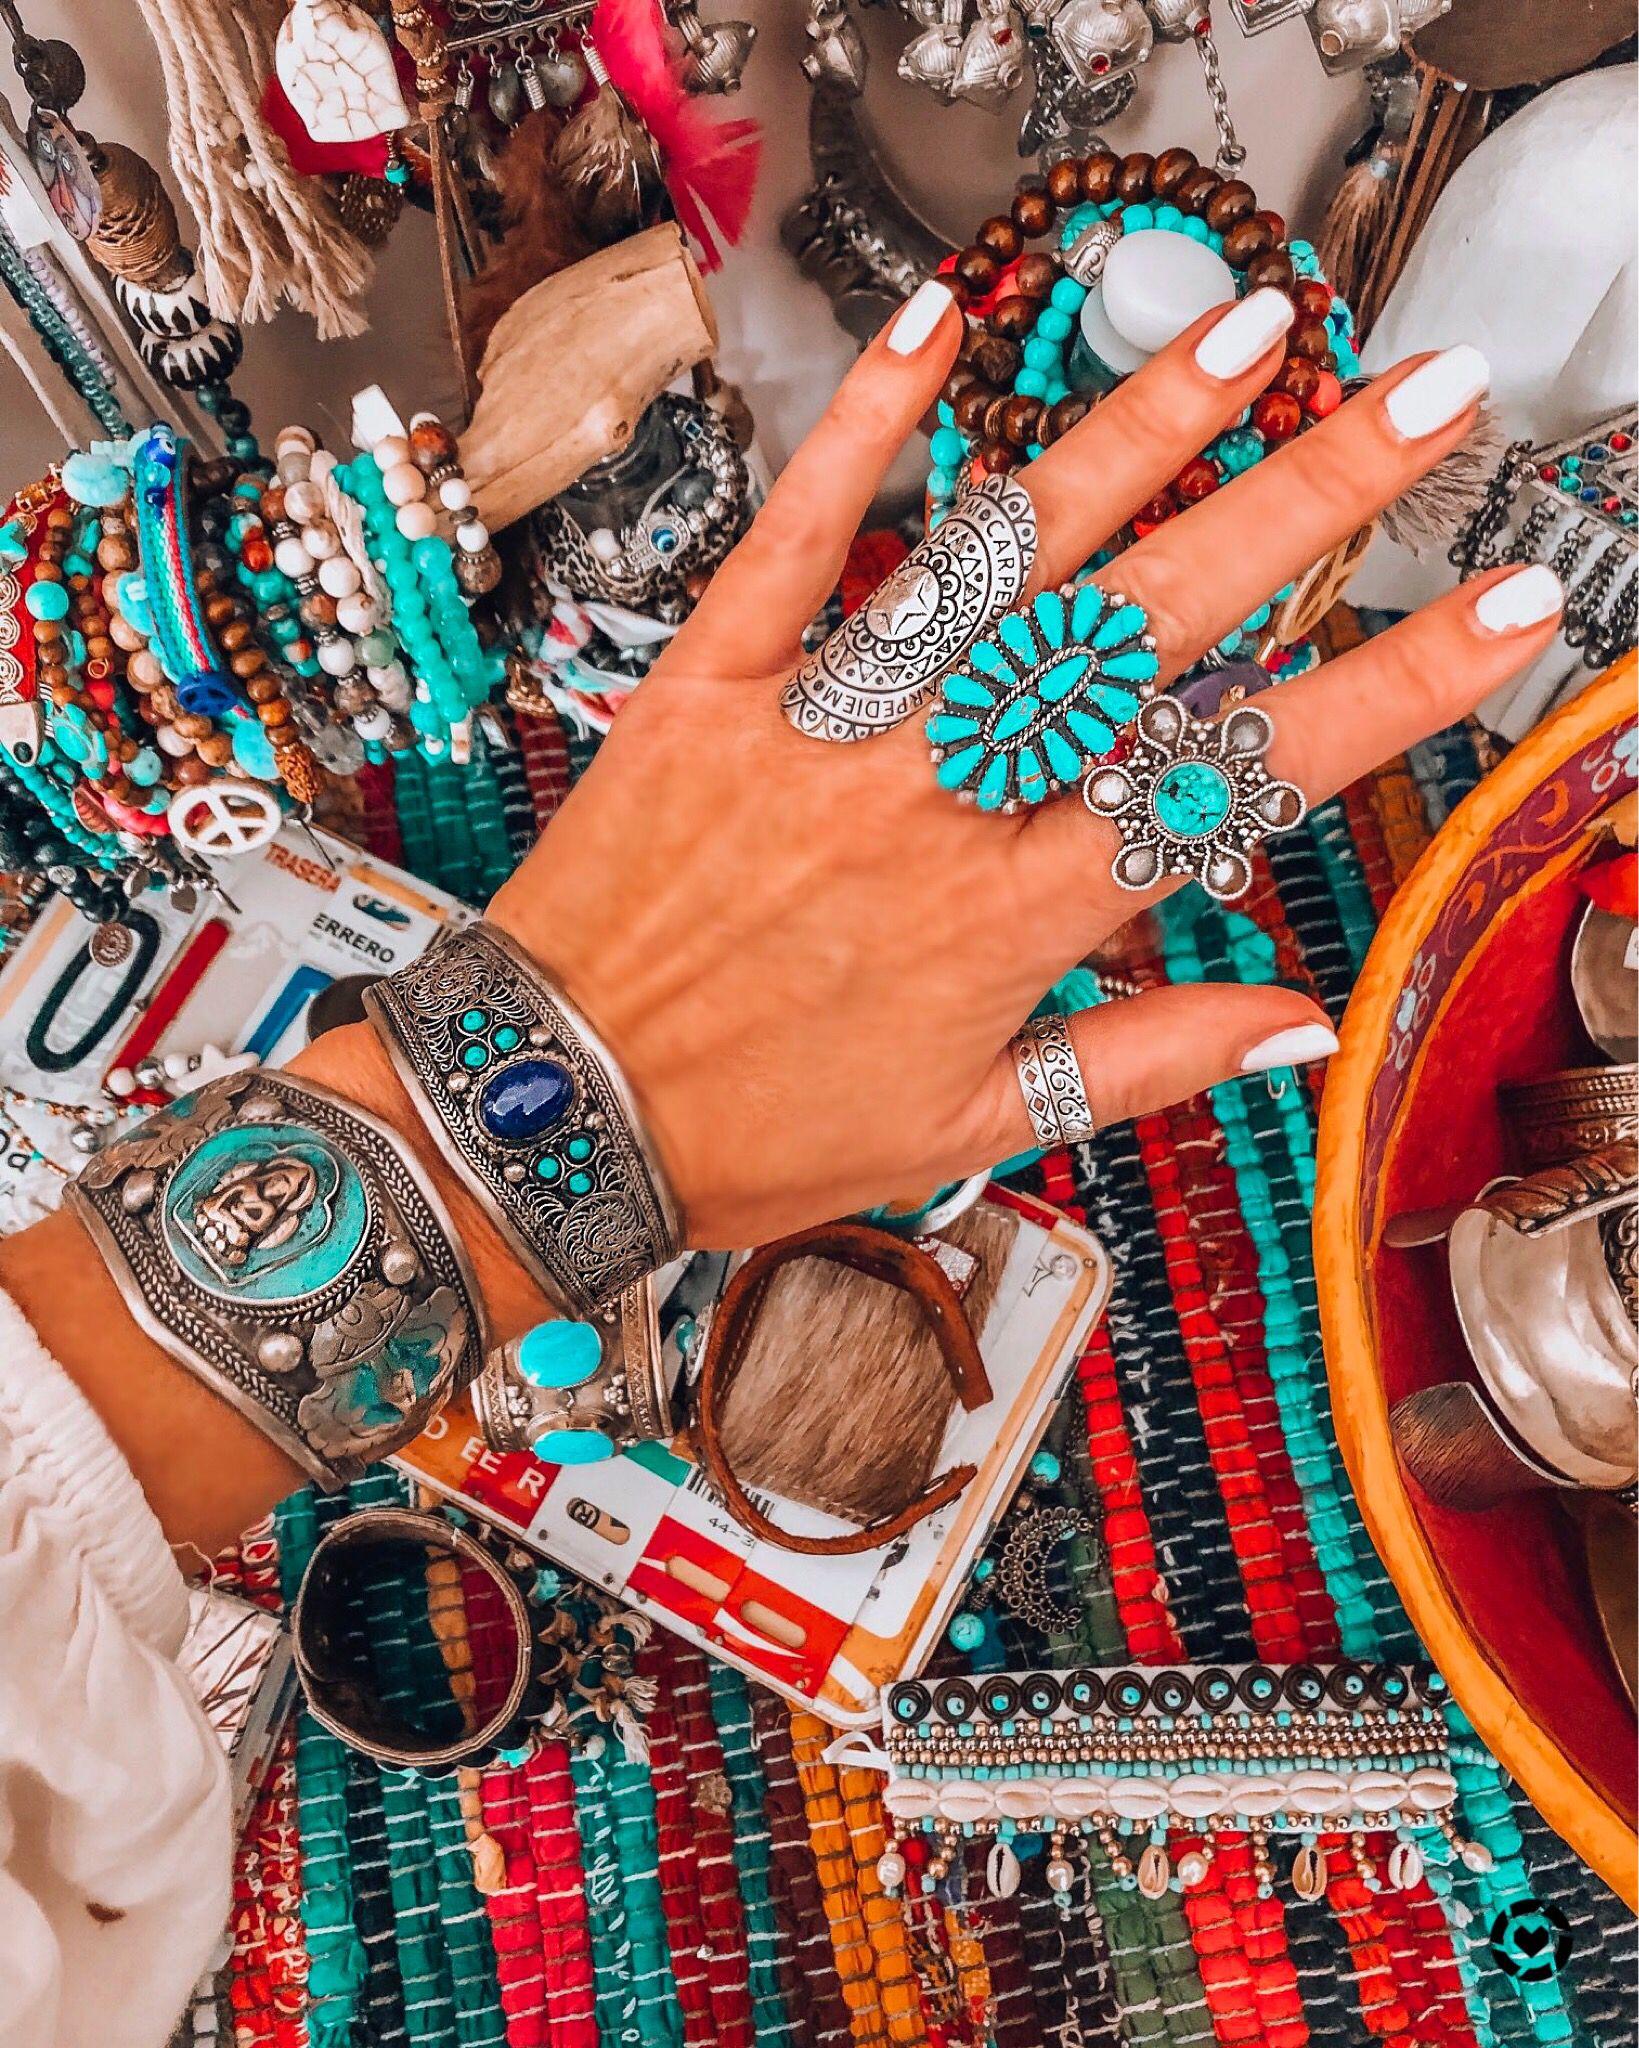 Jewelry bohemian chic style